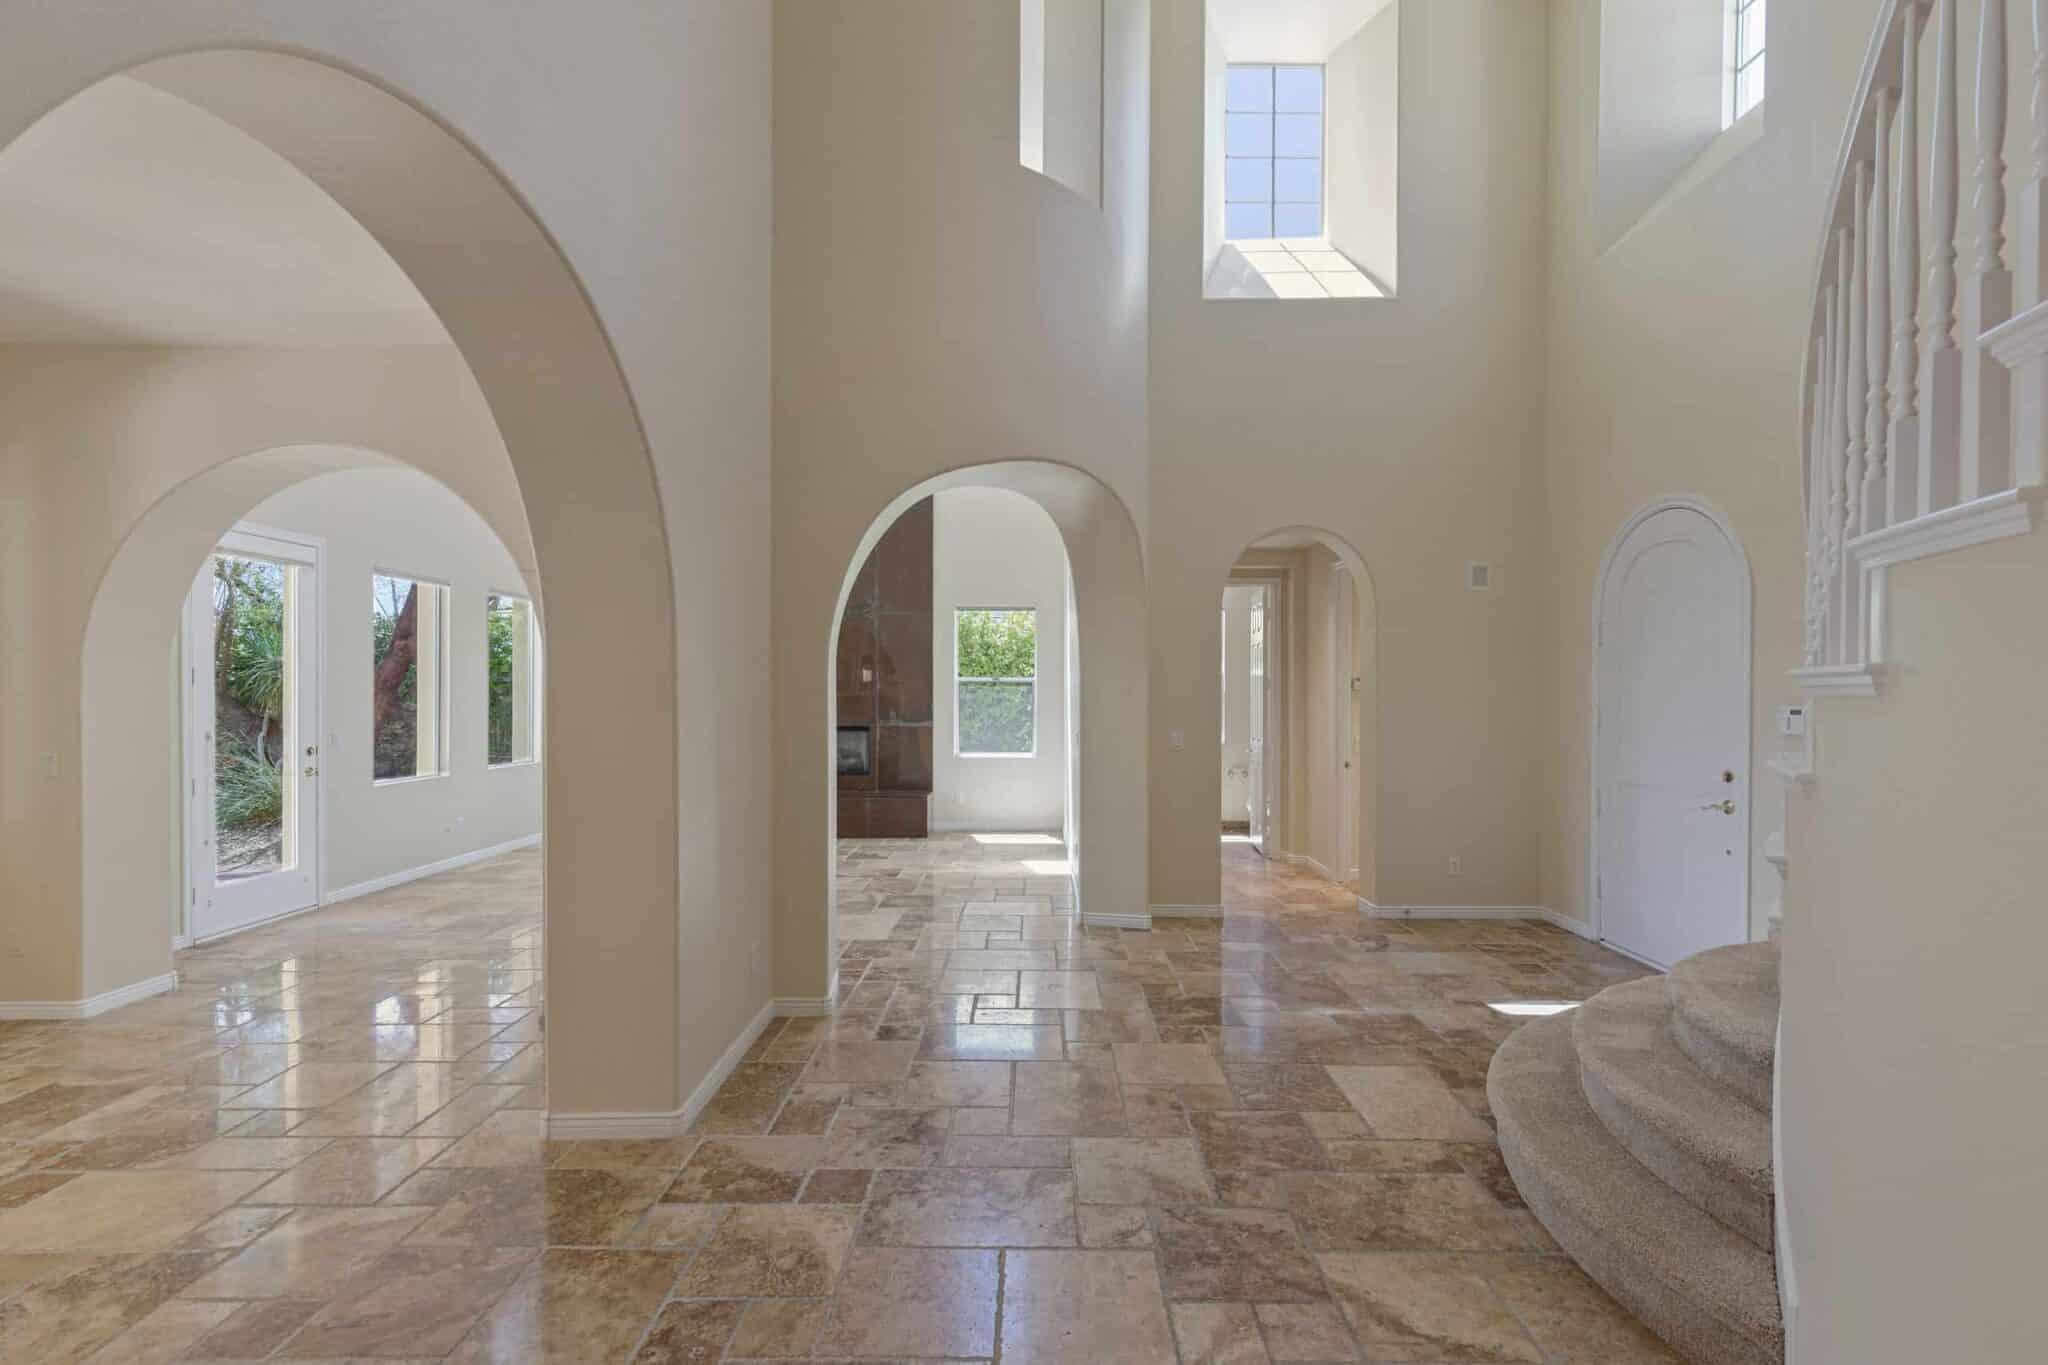 las-vegas-luxry-real-estate-realtor-rob-jensen-company-2620-grassy-spring-place-rrcc08